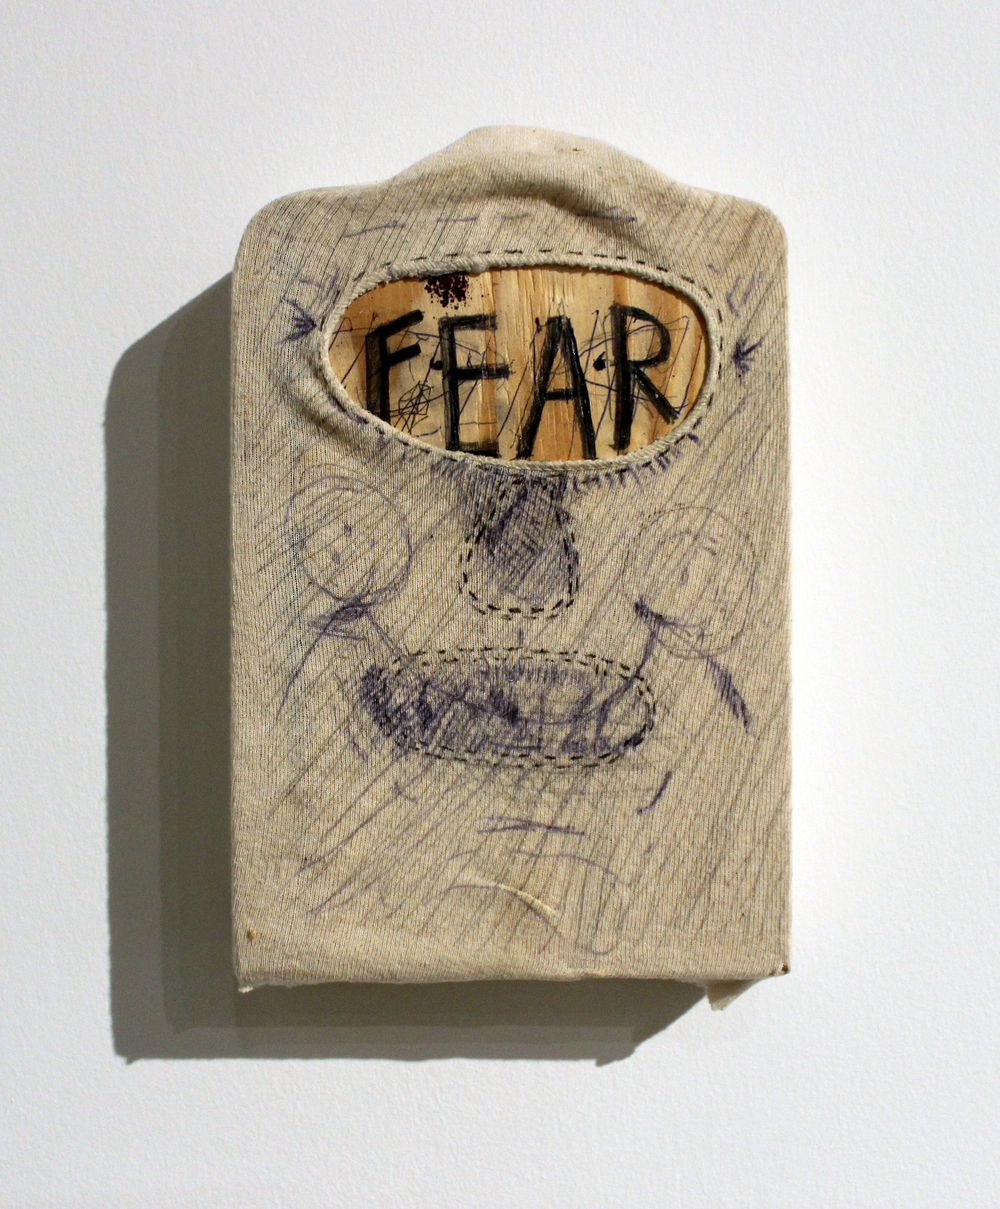 fear_1_2014.jpg